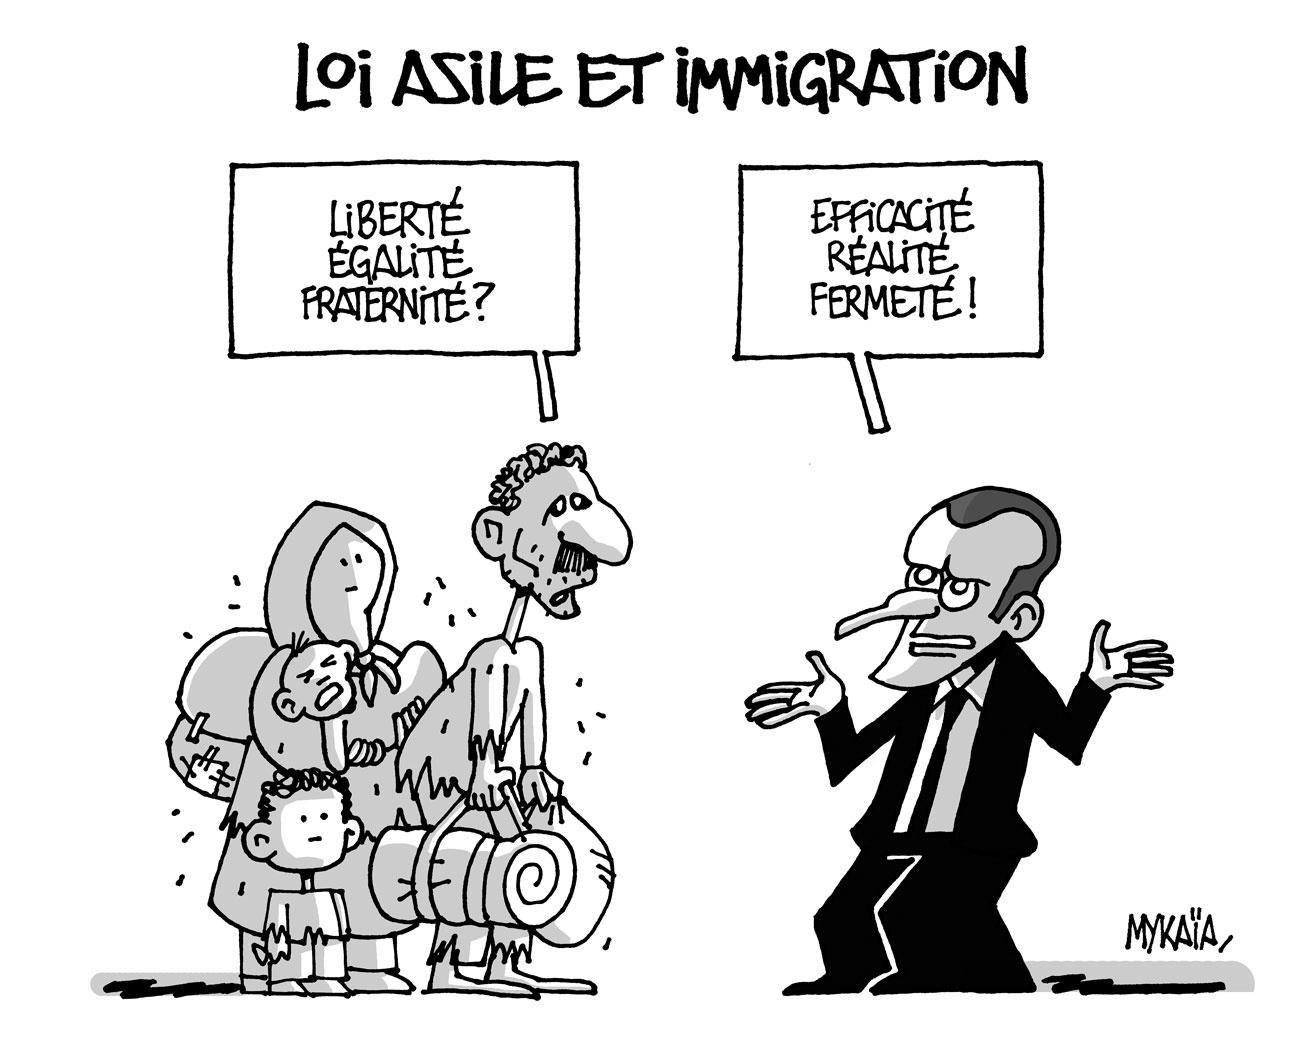 ob_fb29ed_2018-07-30-loi-asile-et-immigration-my